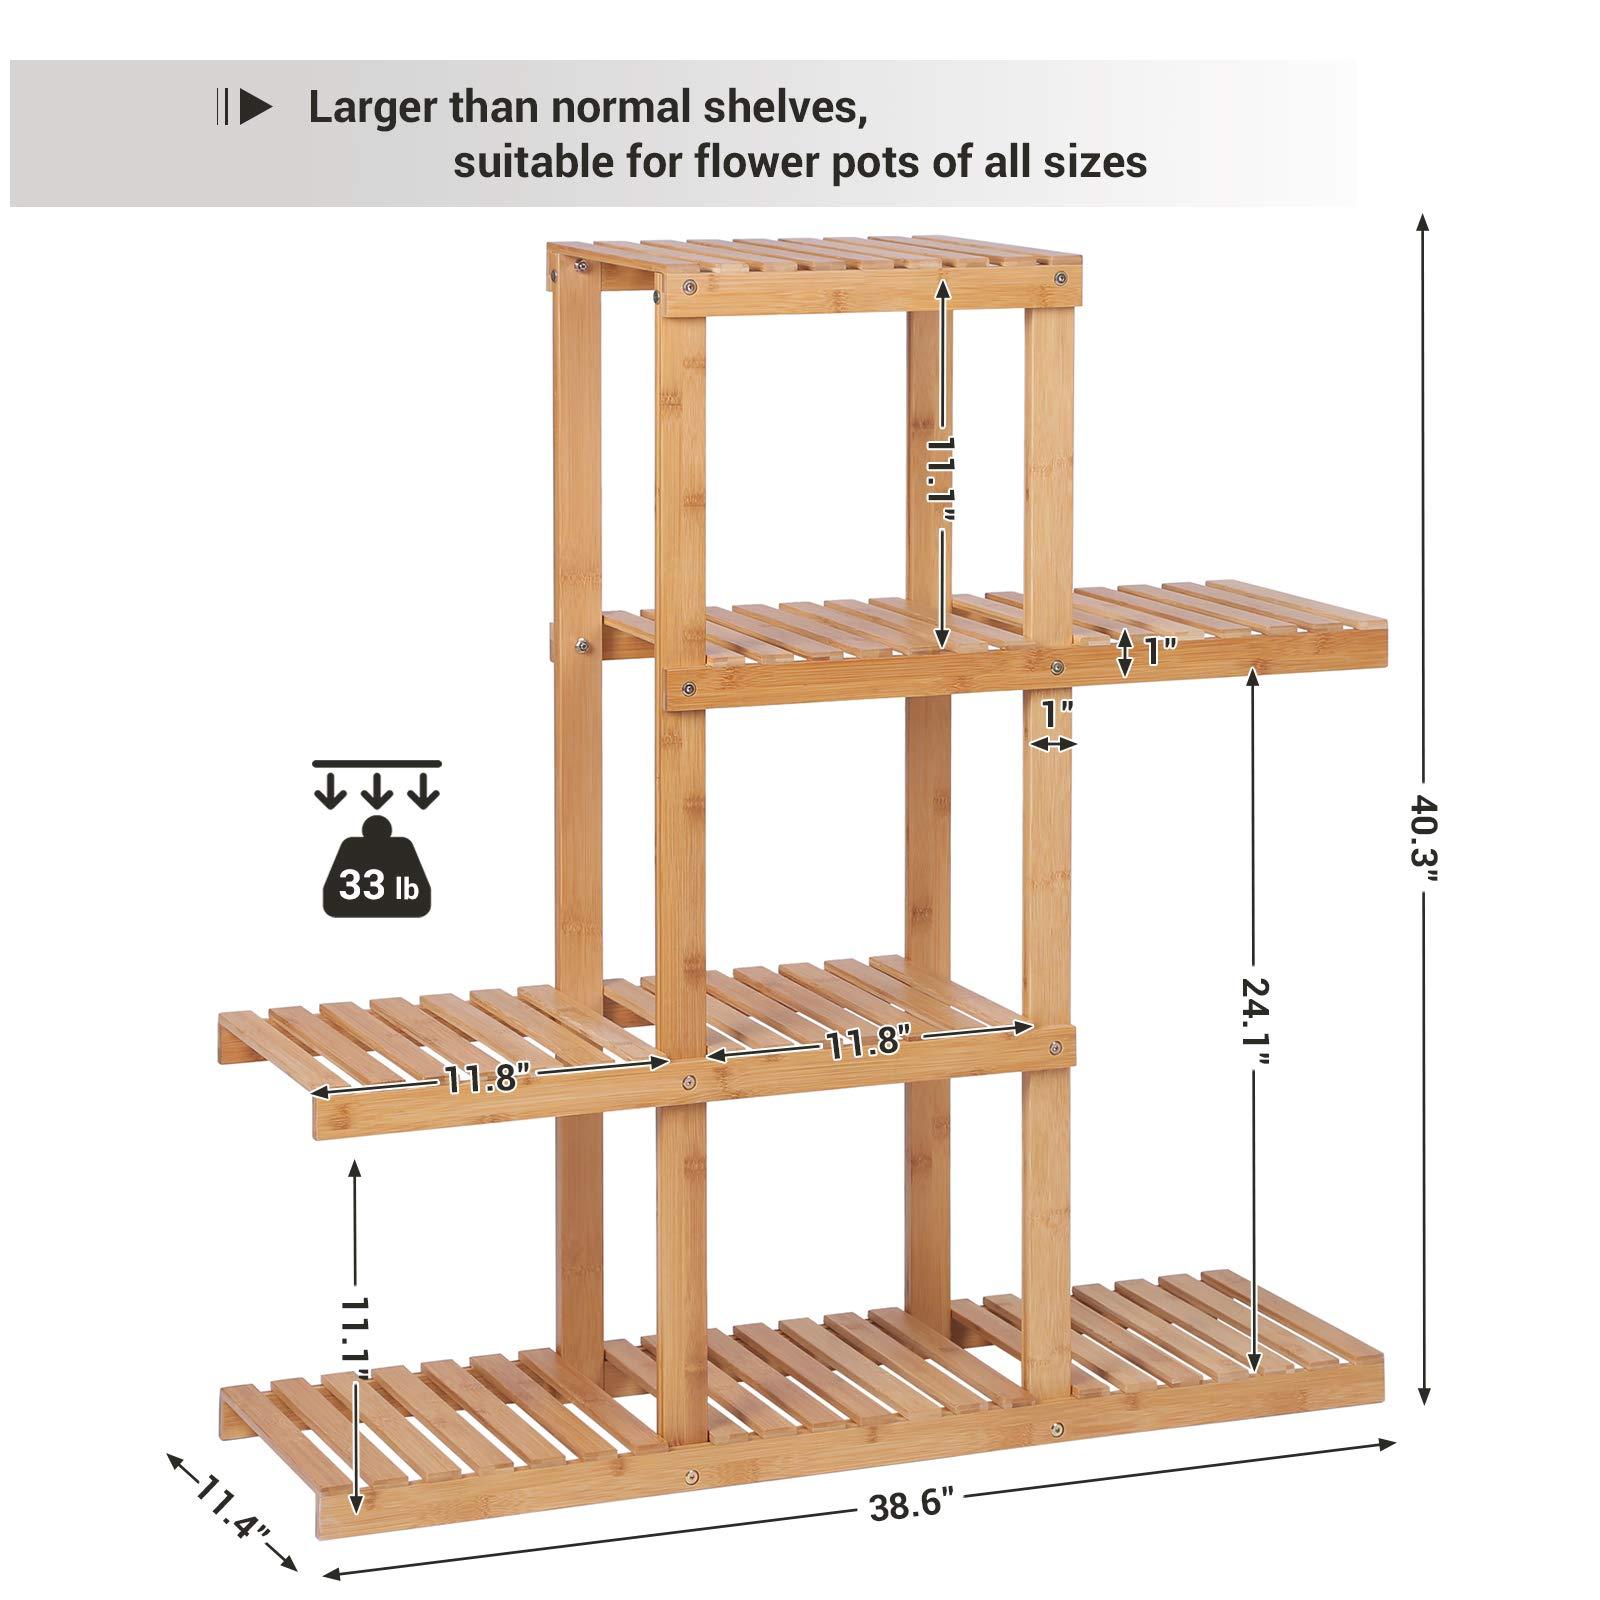 SONGMICS Bamboo Wood Plant Display Rack, Stand Shelf, Flower Pots Holder, 4 Tier Utility Shelving Standing Unit Storage Organizer Rack for Living Room Balcony Hallway Bathroom UBCB91N by SONGMICS (Image #5)